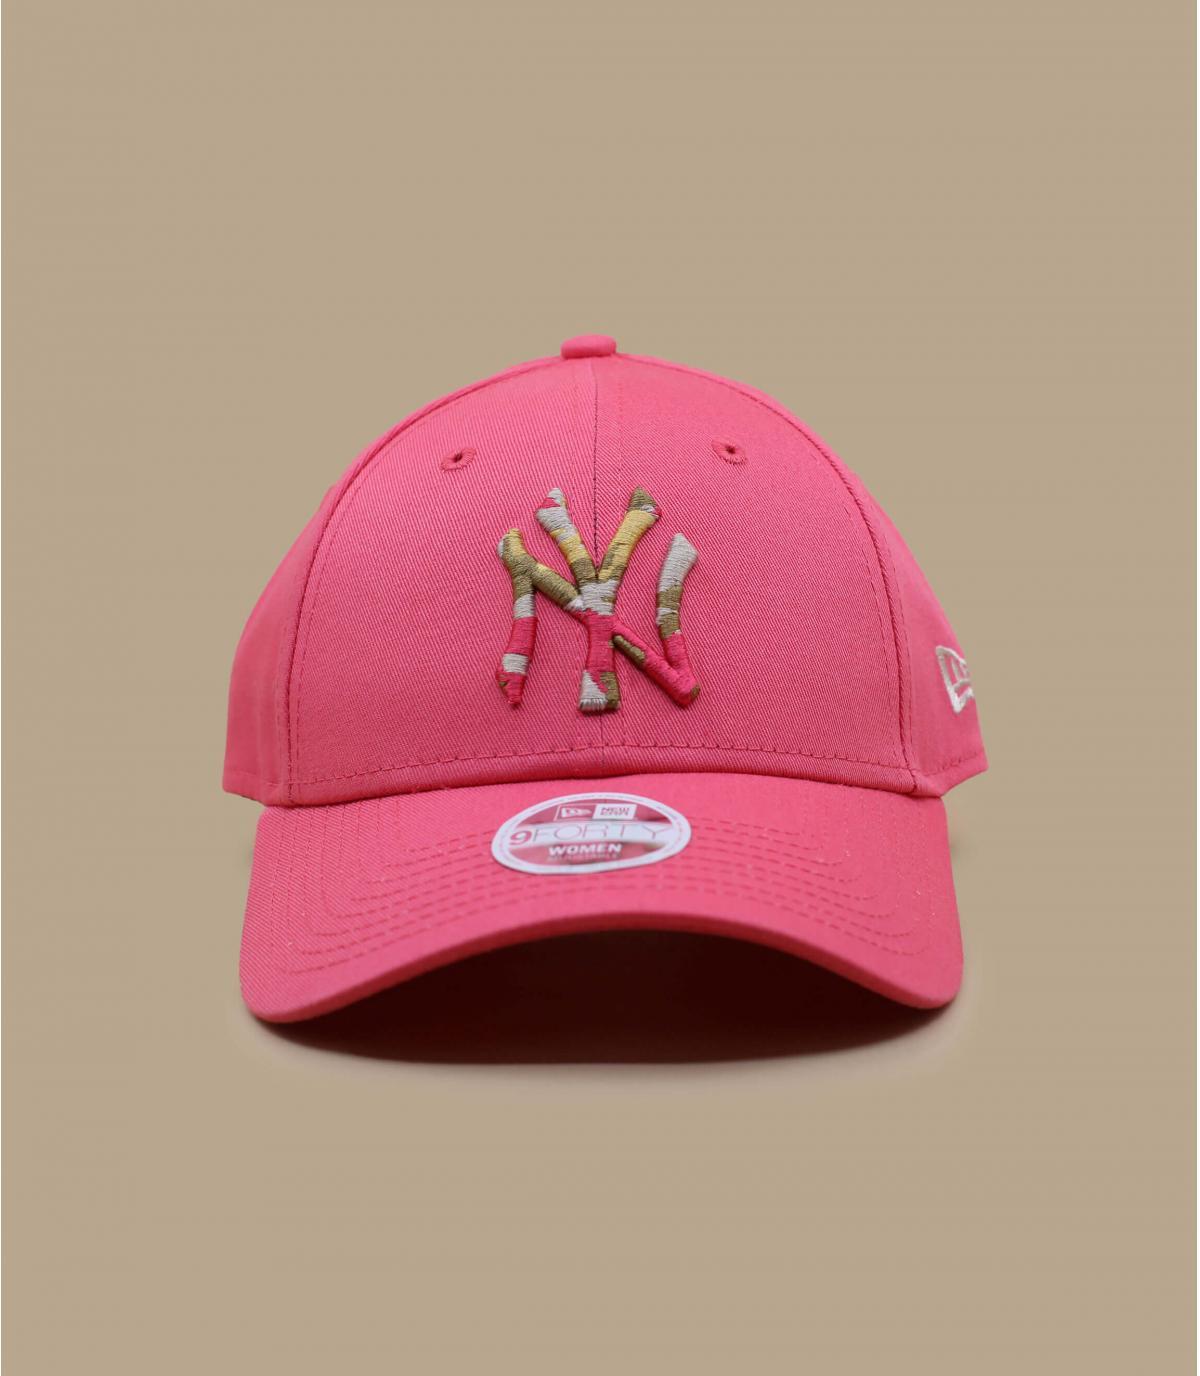 Details Wmn Camo Infill NY 940 pink - Abbildung 2